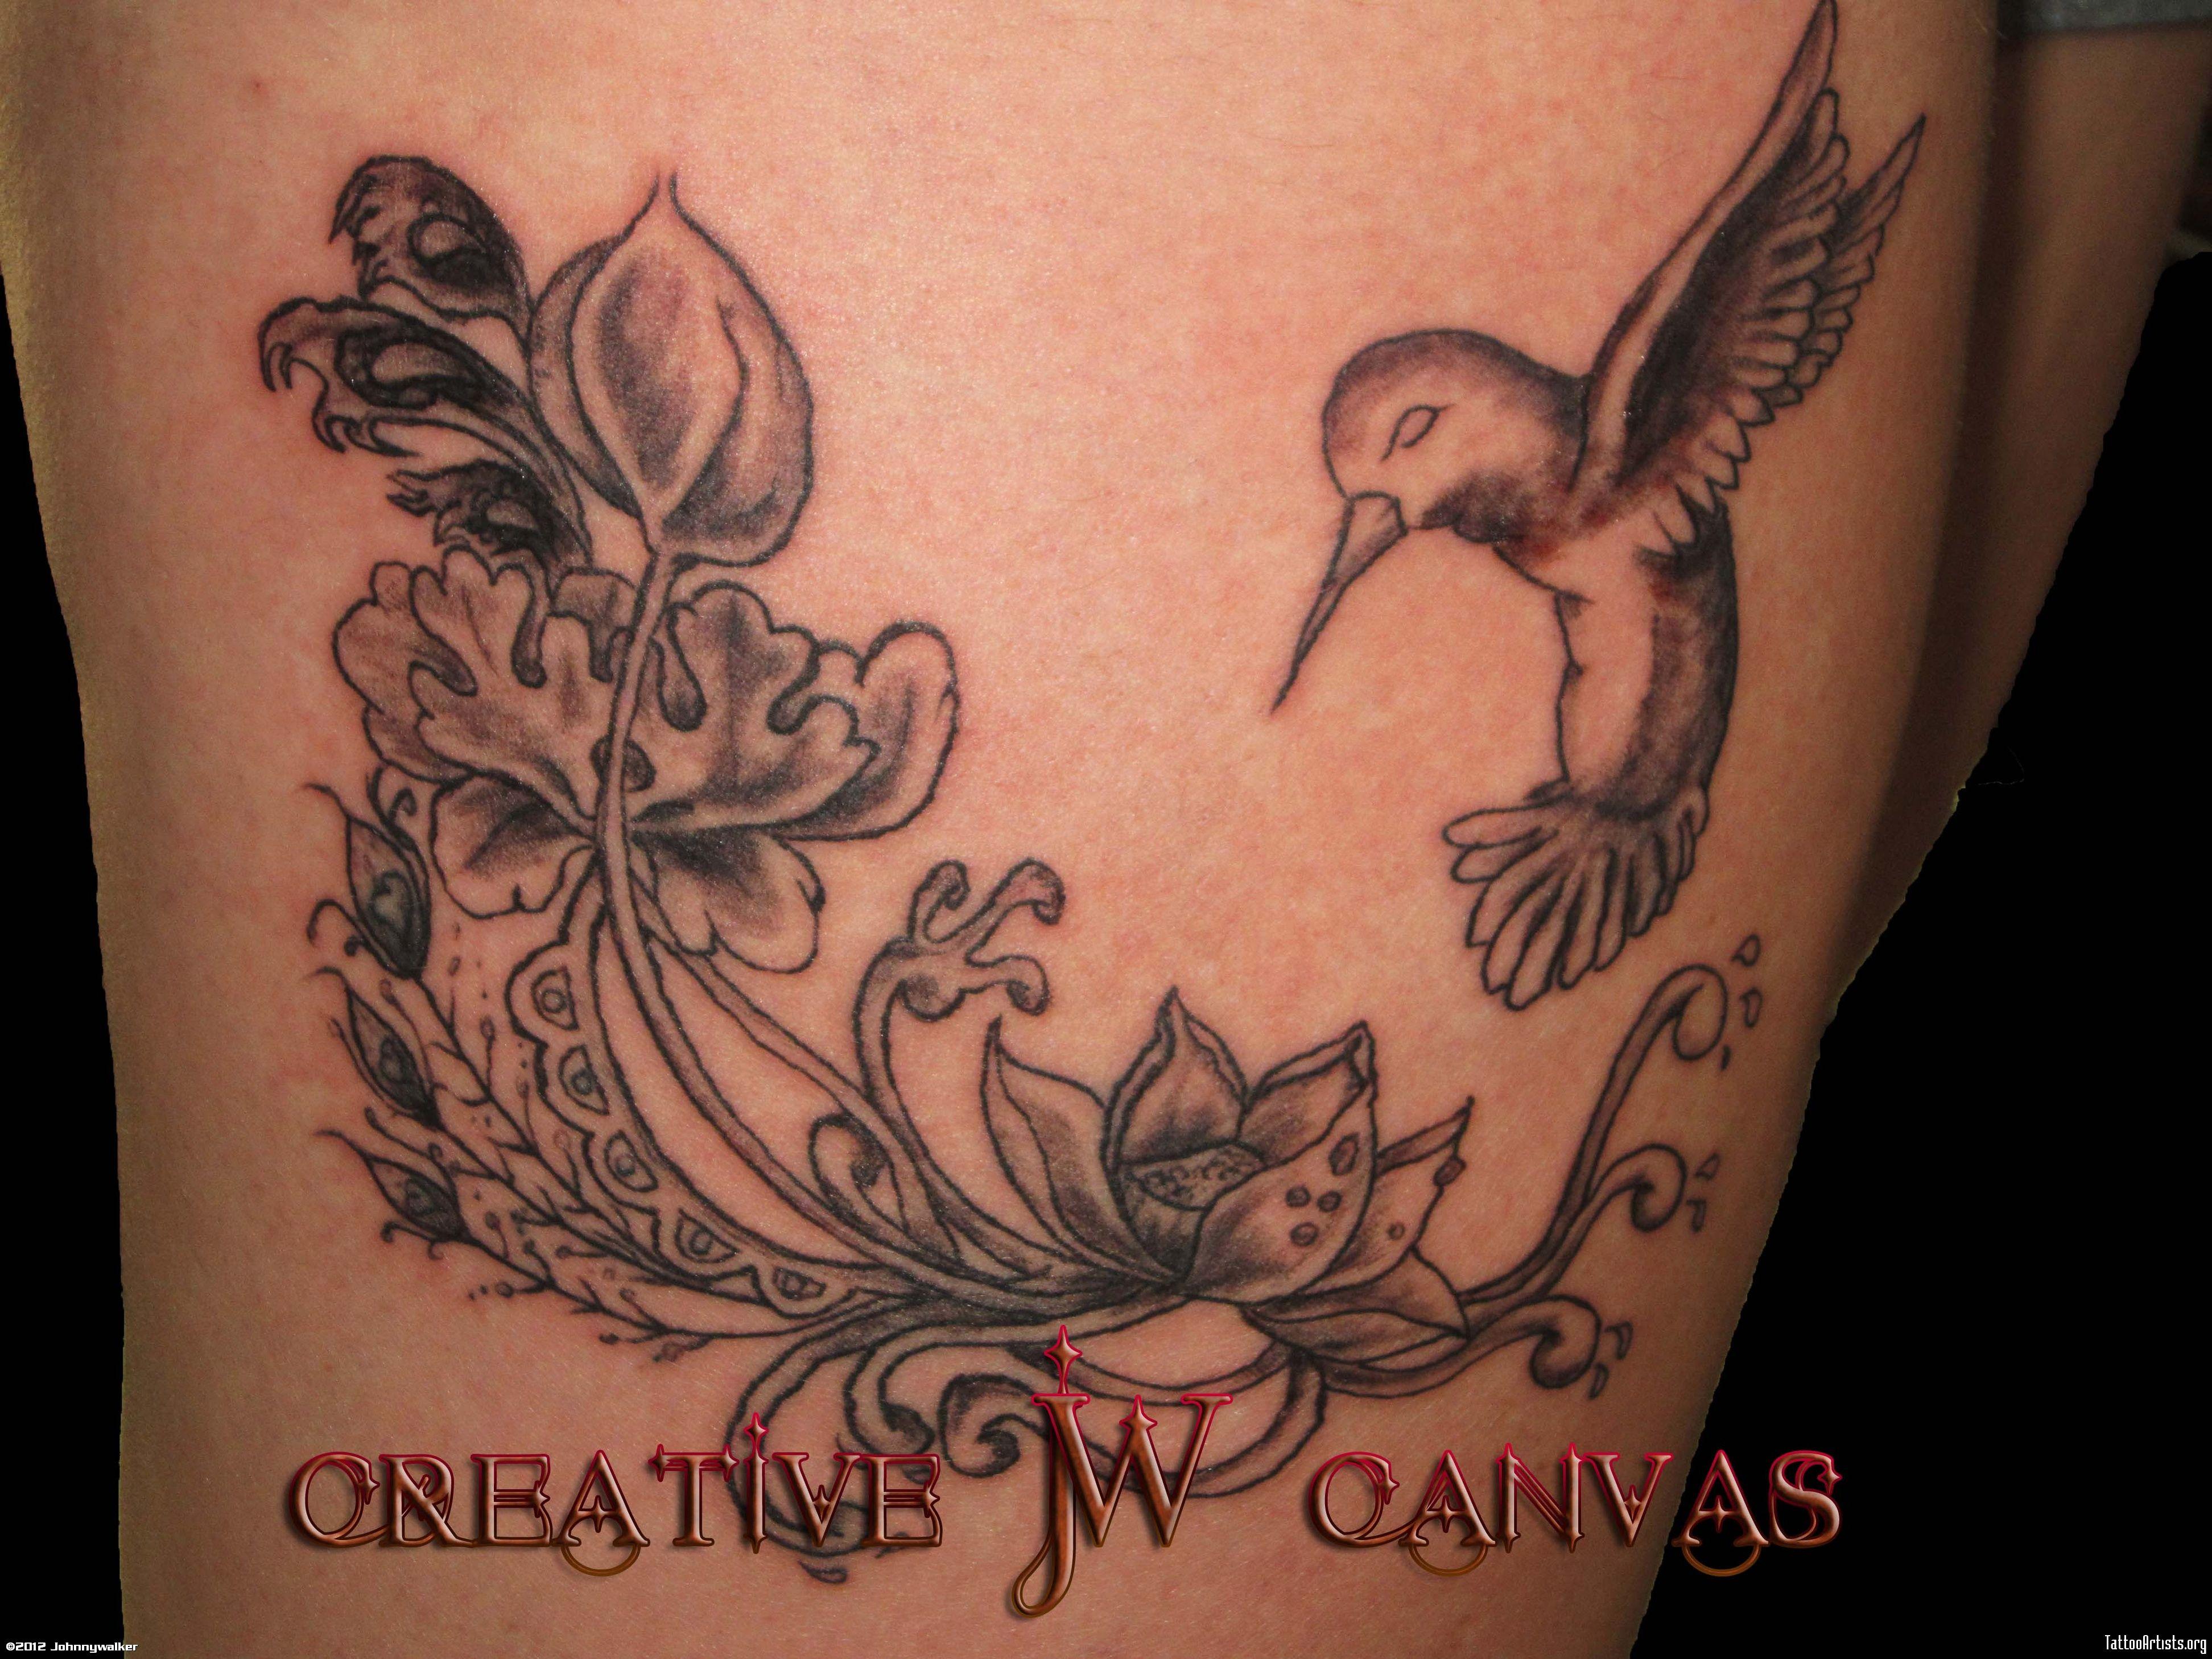 De colibri en la espalda significado tatuaje colibri tatuaje tattoo - Tatuaje De Colibr Hummingbird Tattoo Artistsorg